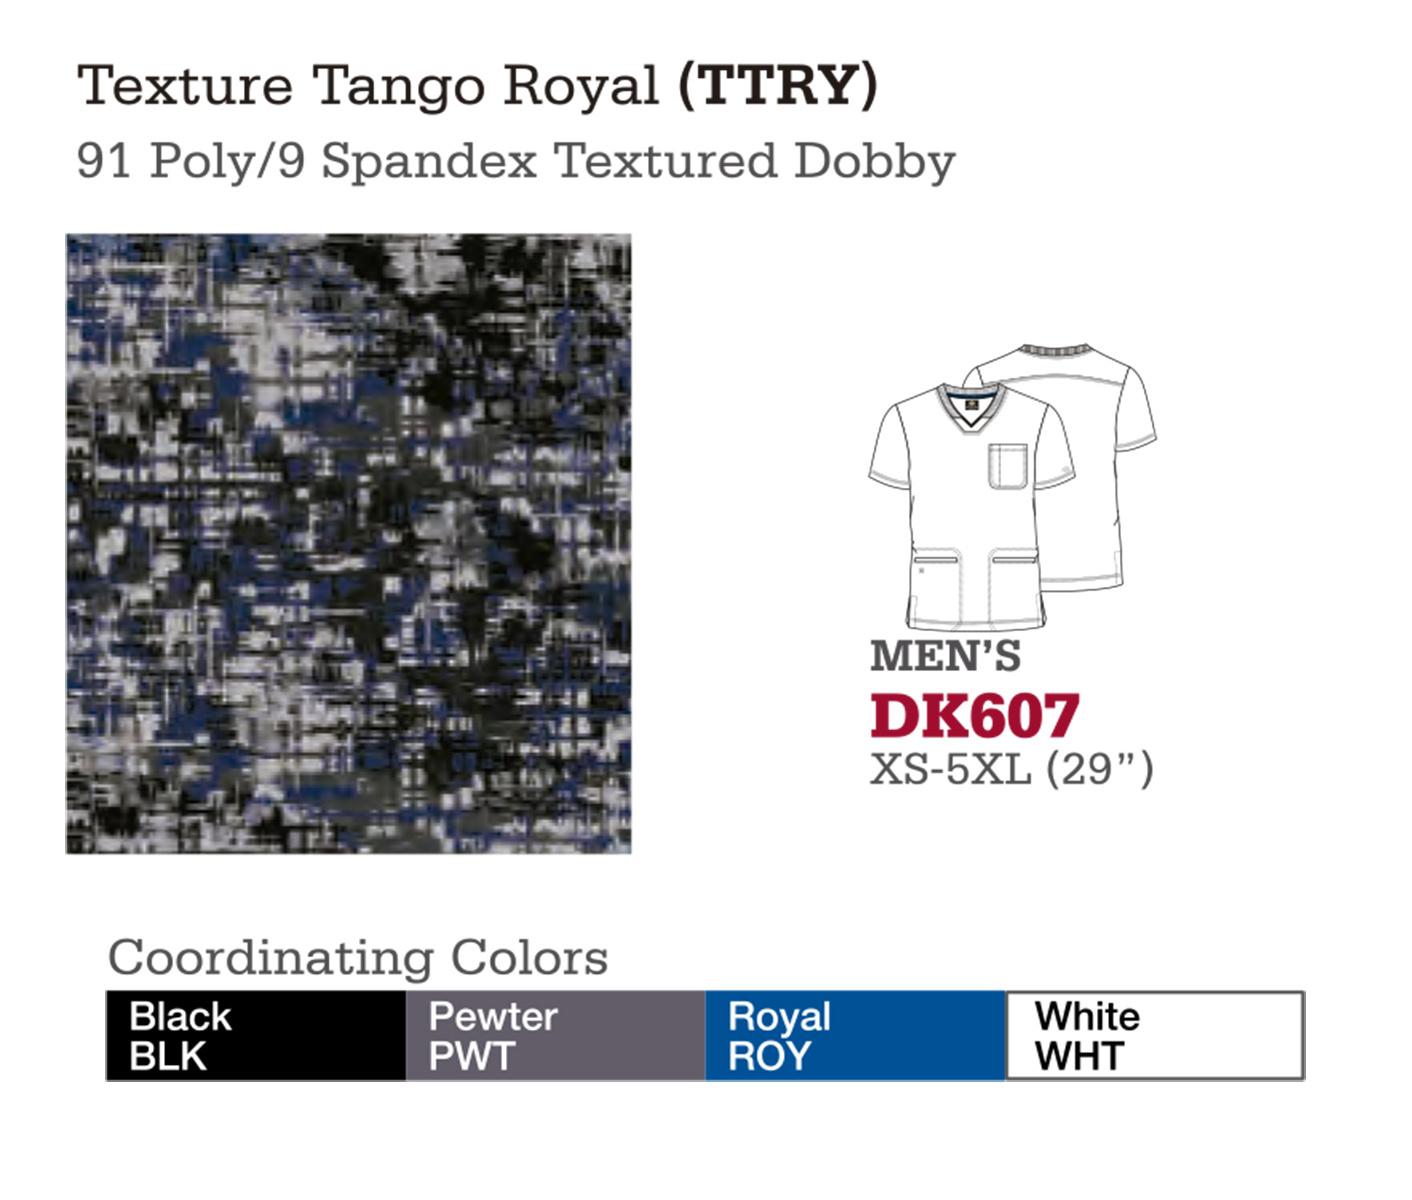 Texture Tango Royal. DK607.